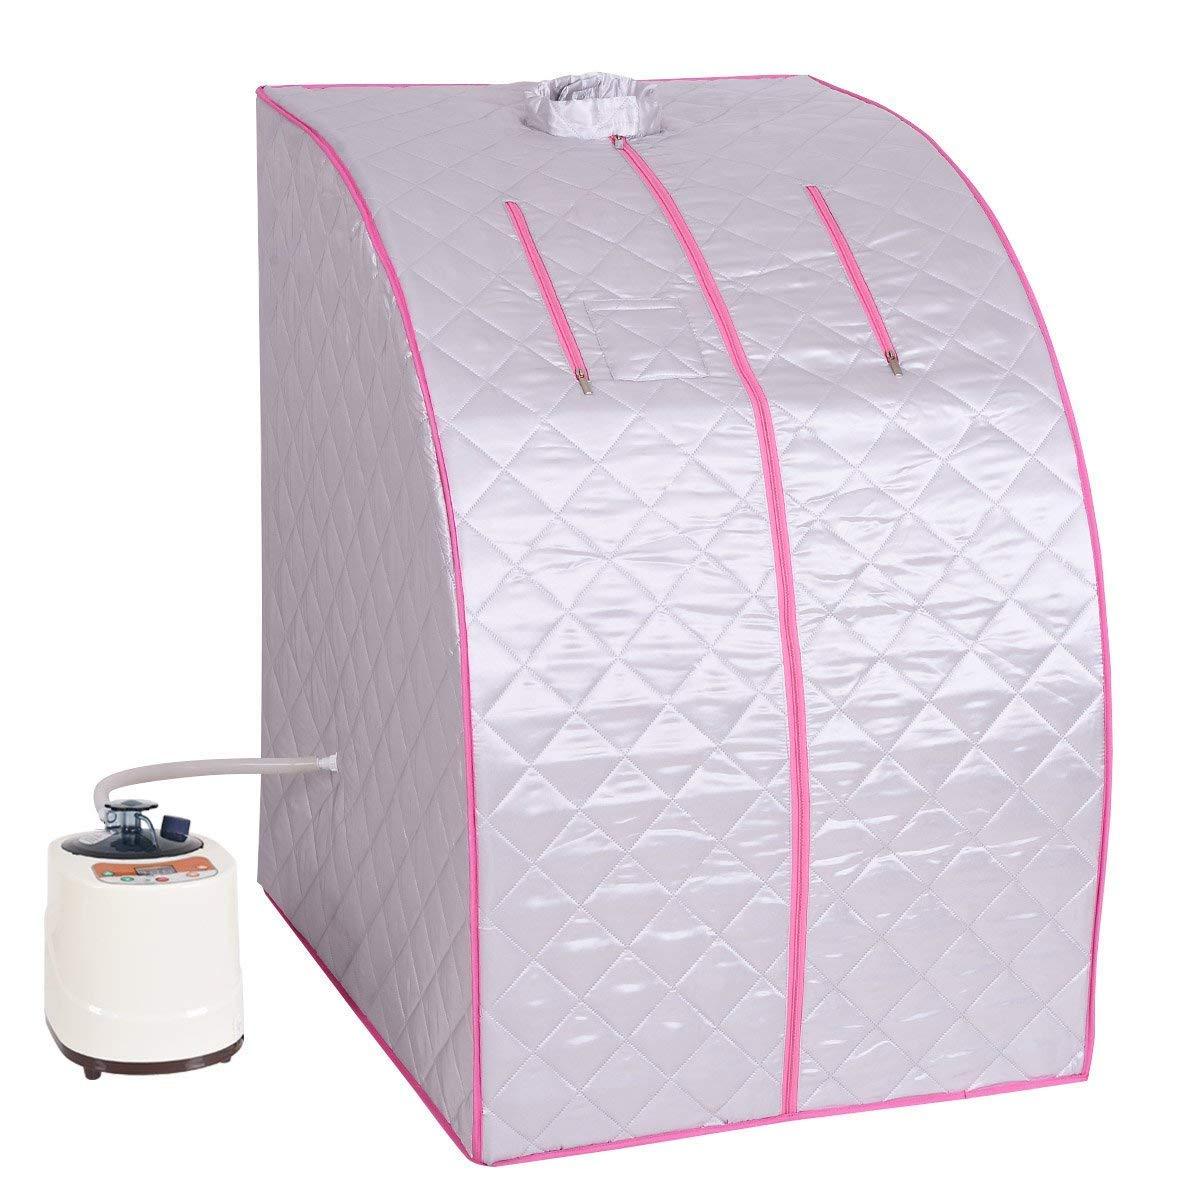 Giantex Portable 2L Steam Sauna Spa Full Body Slimming Loss Weight Detox Therapy w/Chair (Coffee) BA7175CF